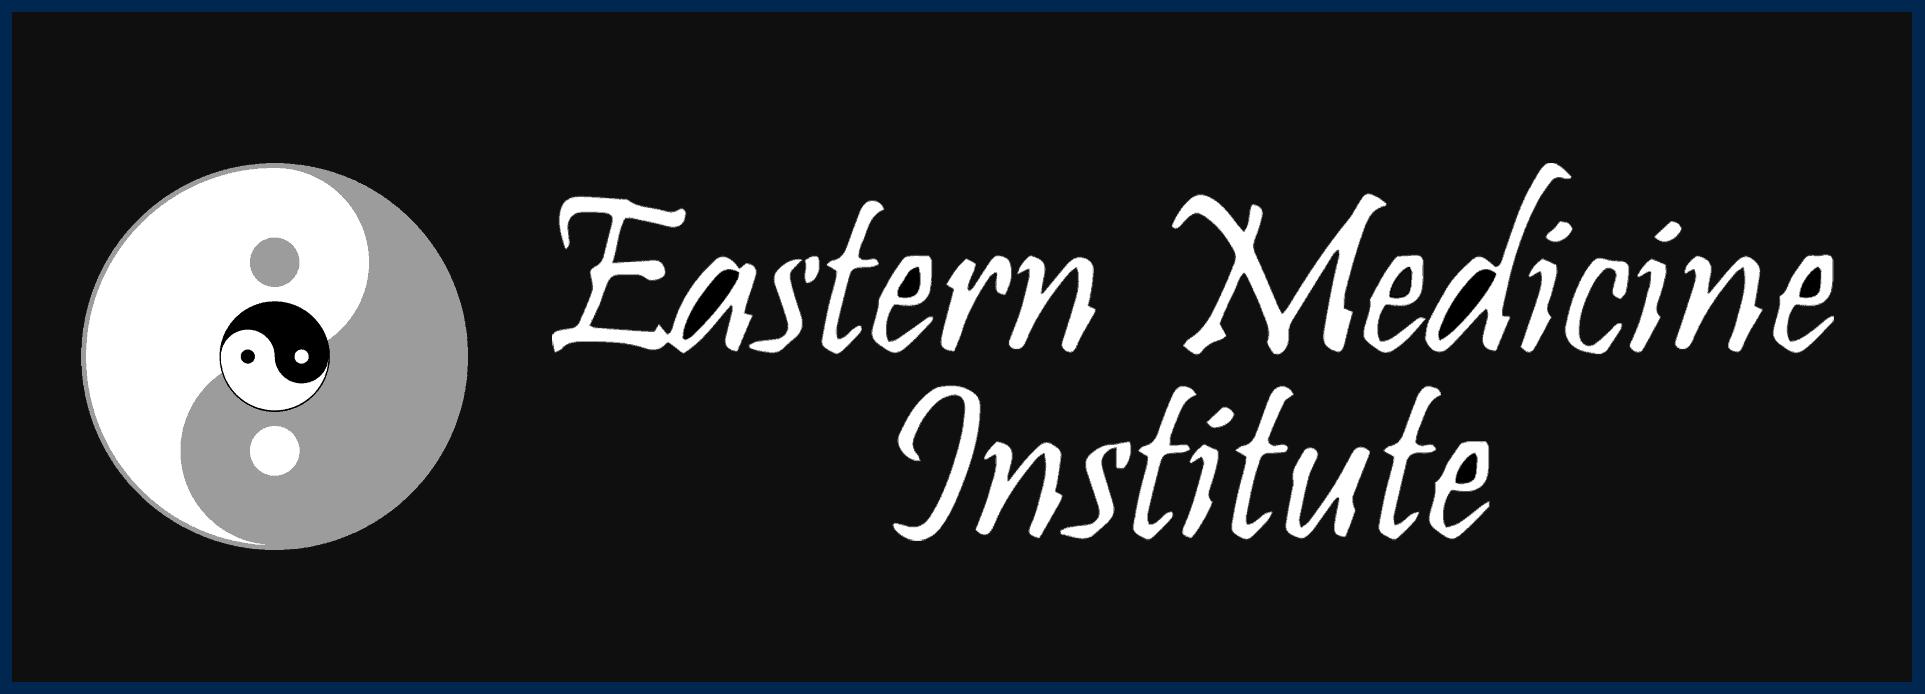 Eastern medicine Logo - Yin Yang